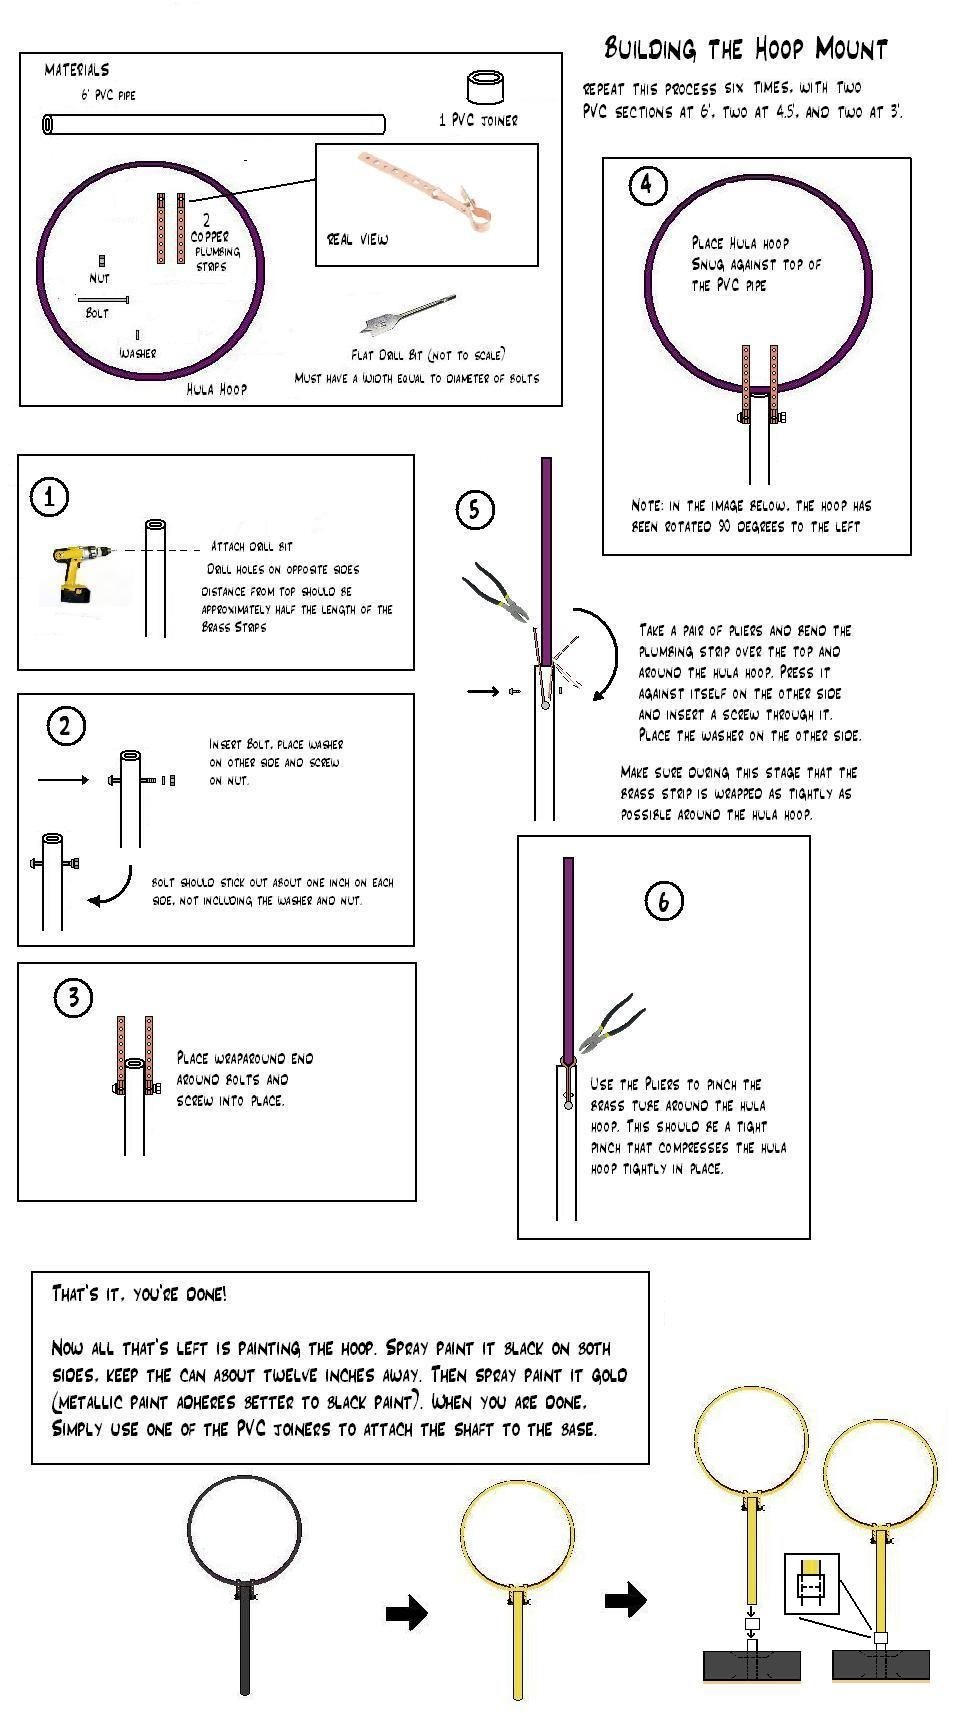 quidditch board diagram